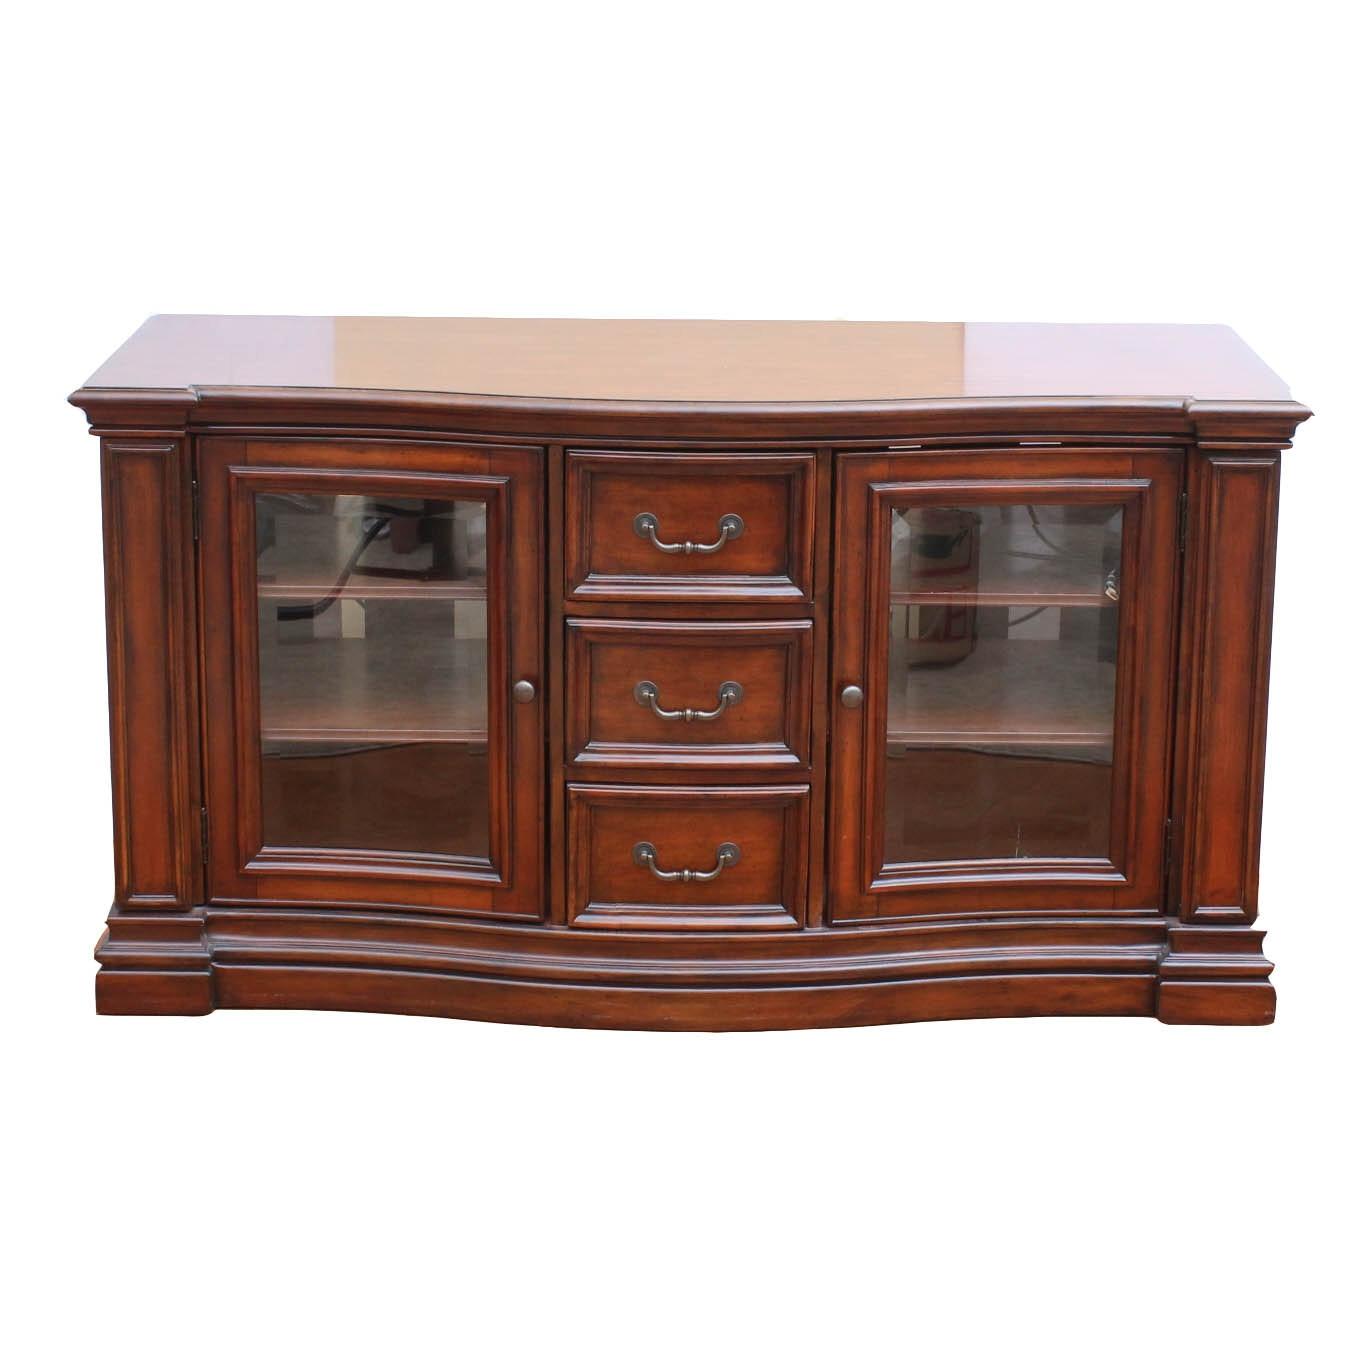 Hooker Furniture Cherry Veneer Credenza/Entertainment Stand